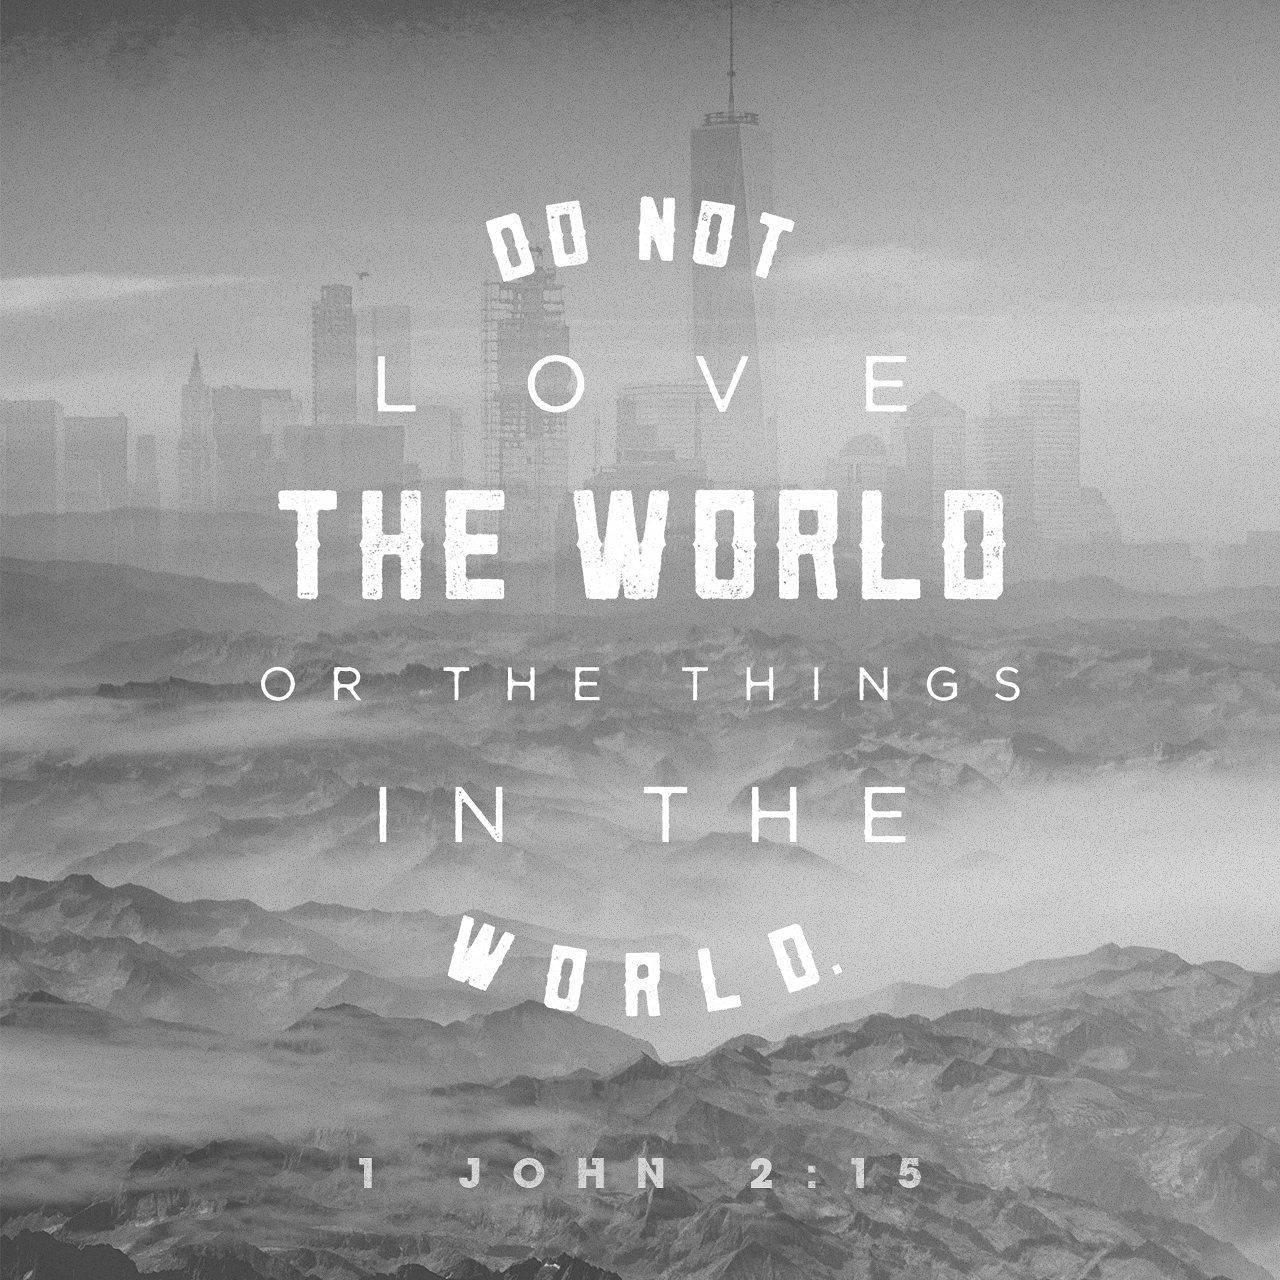 Christian verse